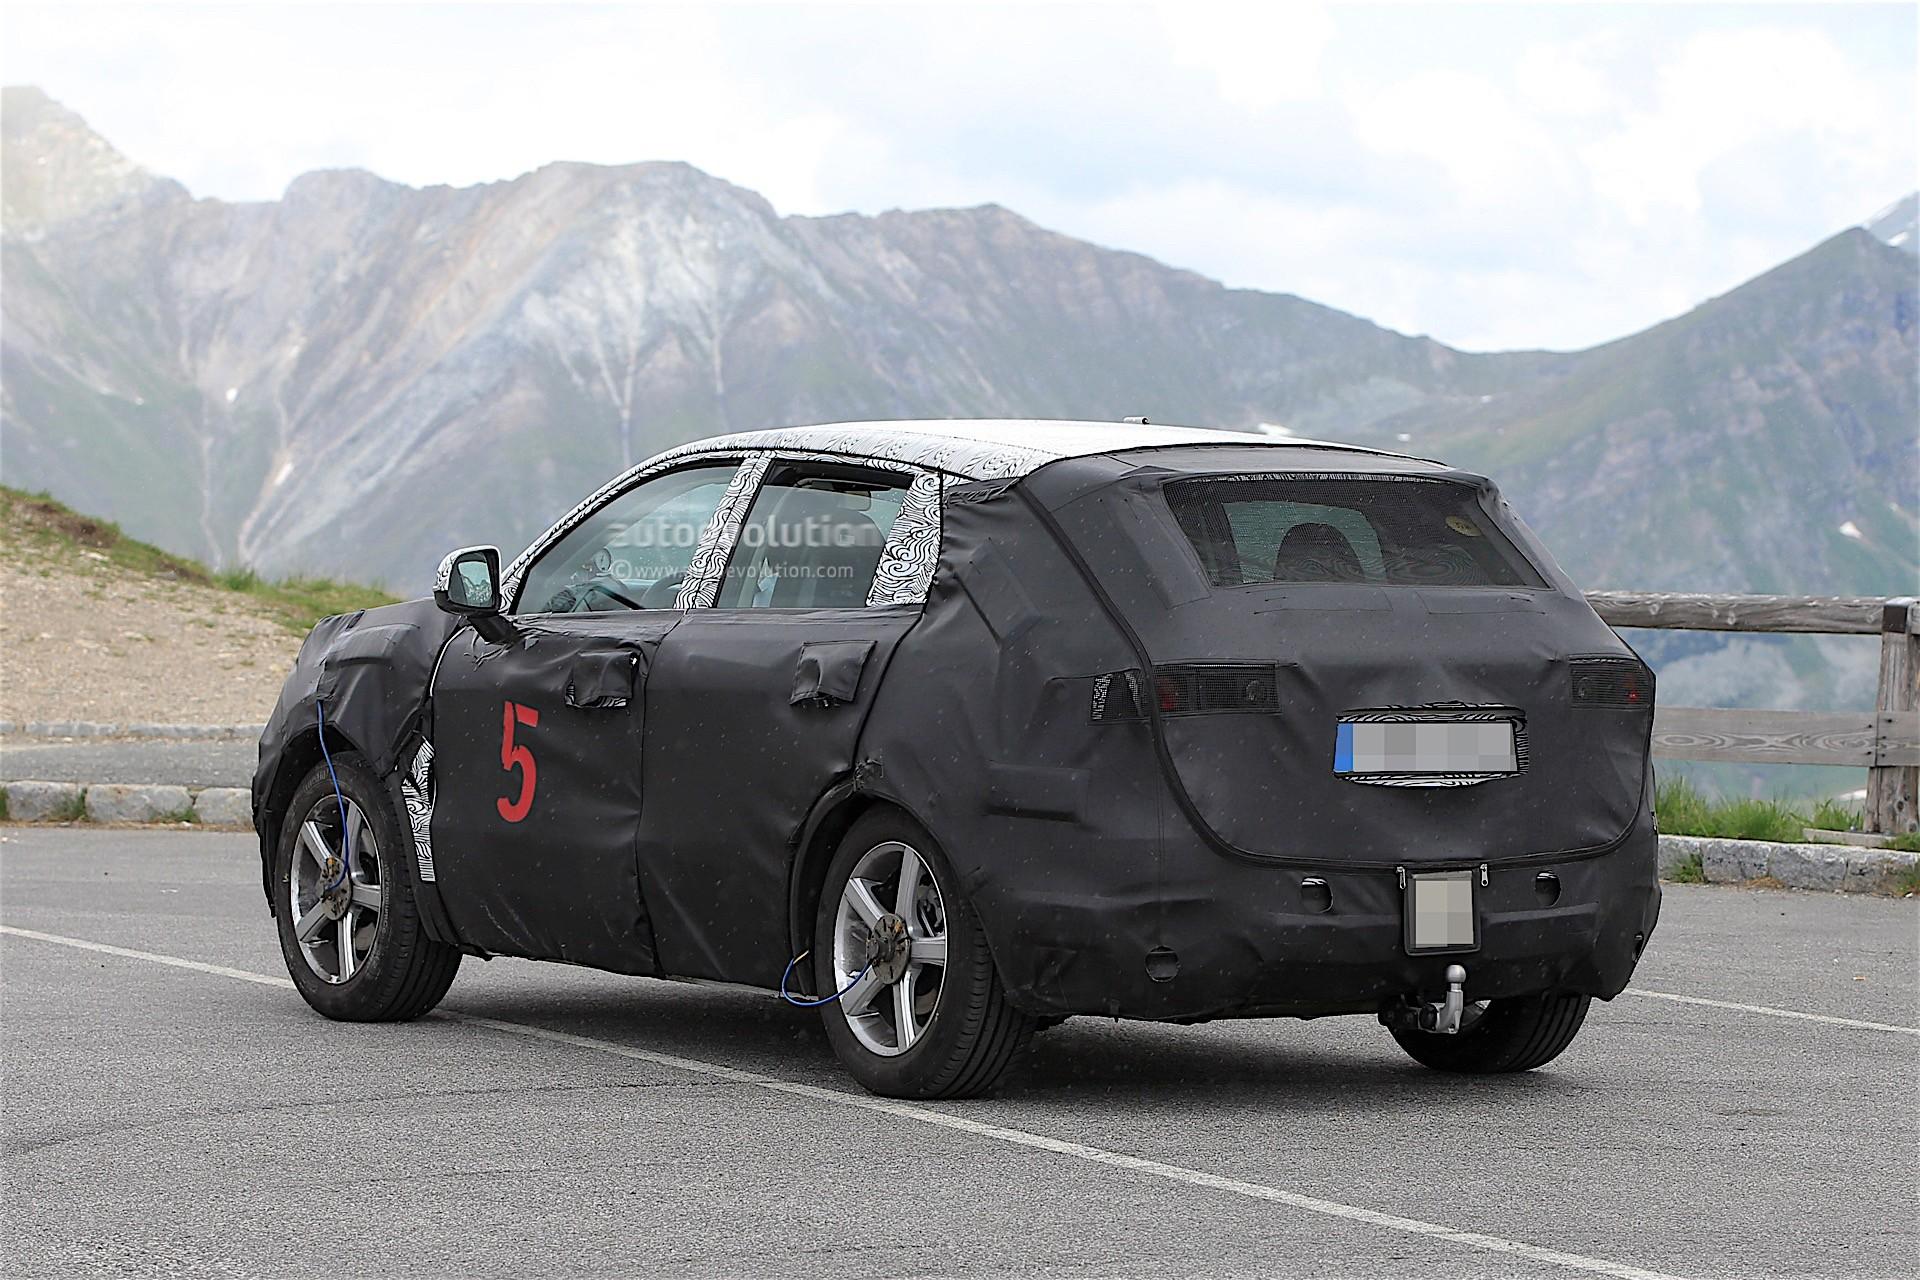 2017 - [Lynk&Co] 01 SUV Geely-suv-spy_7